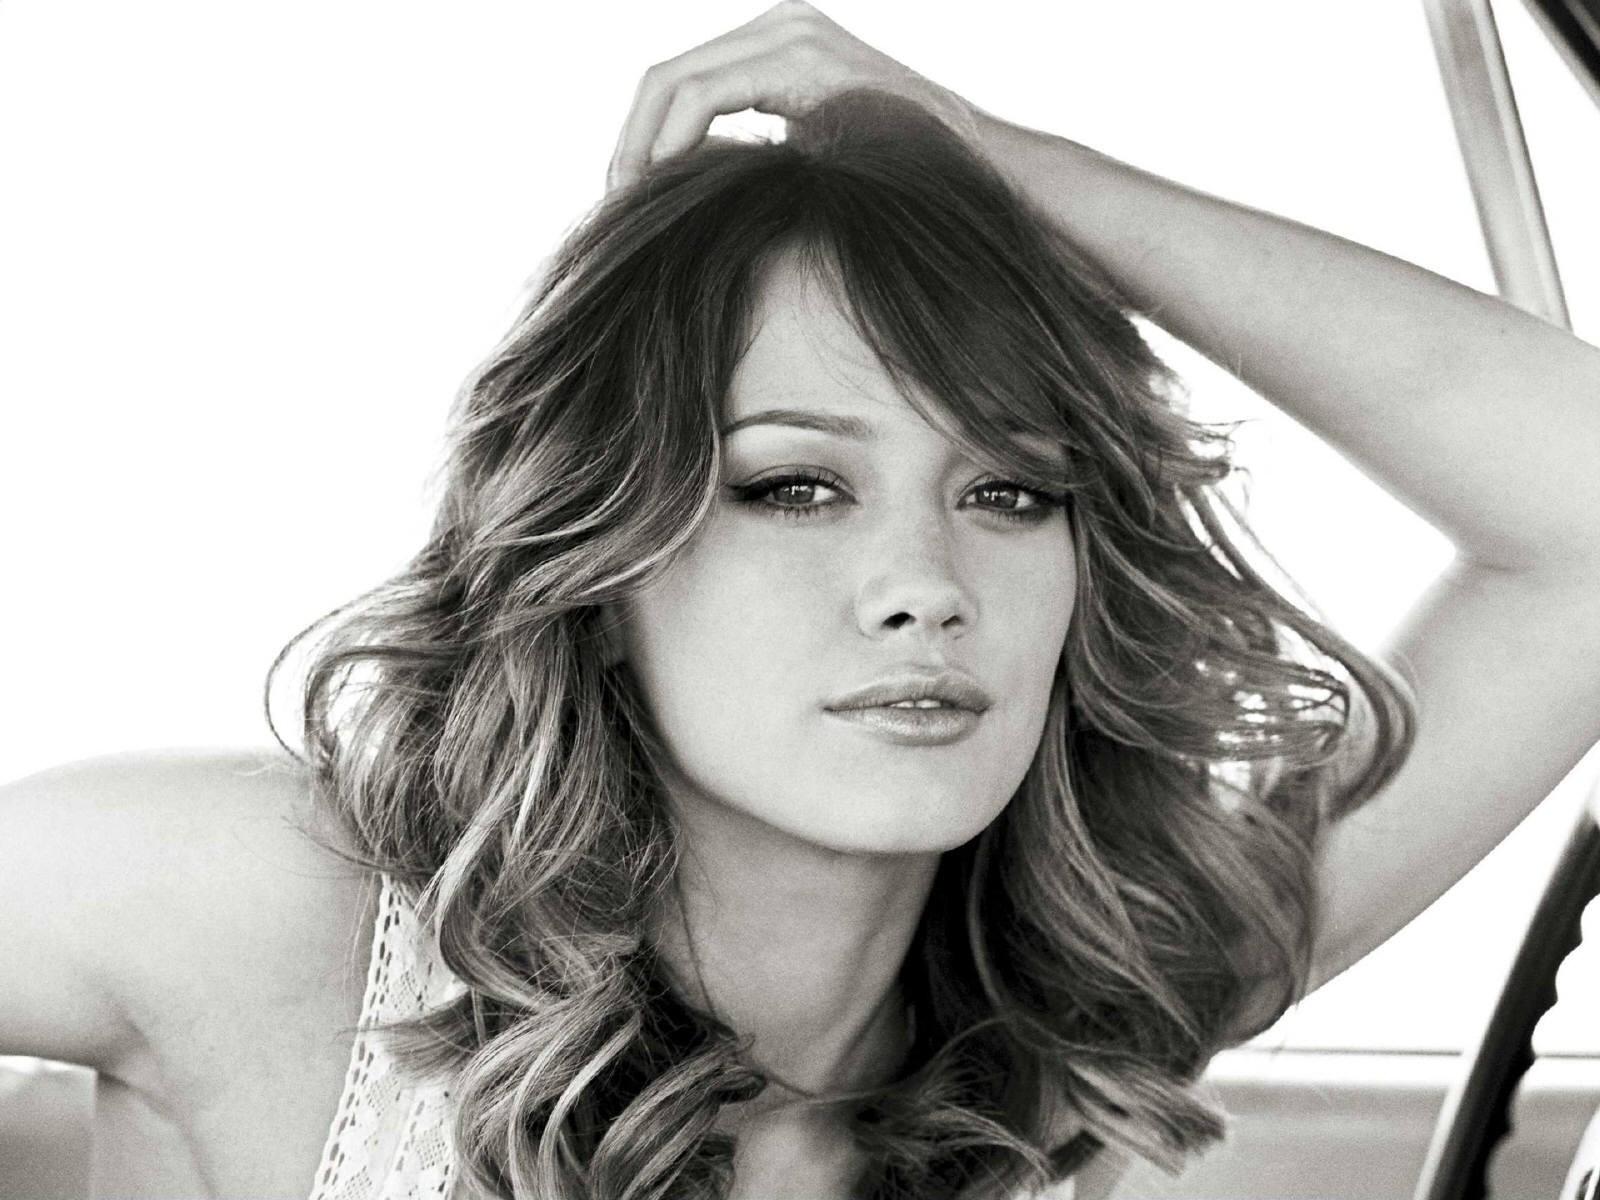 Wallpaper di Hilary Duff - 60